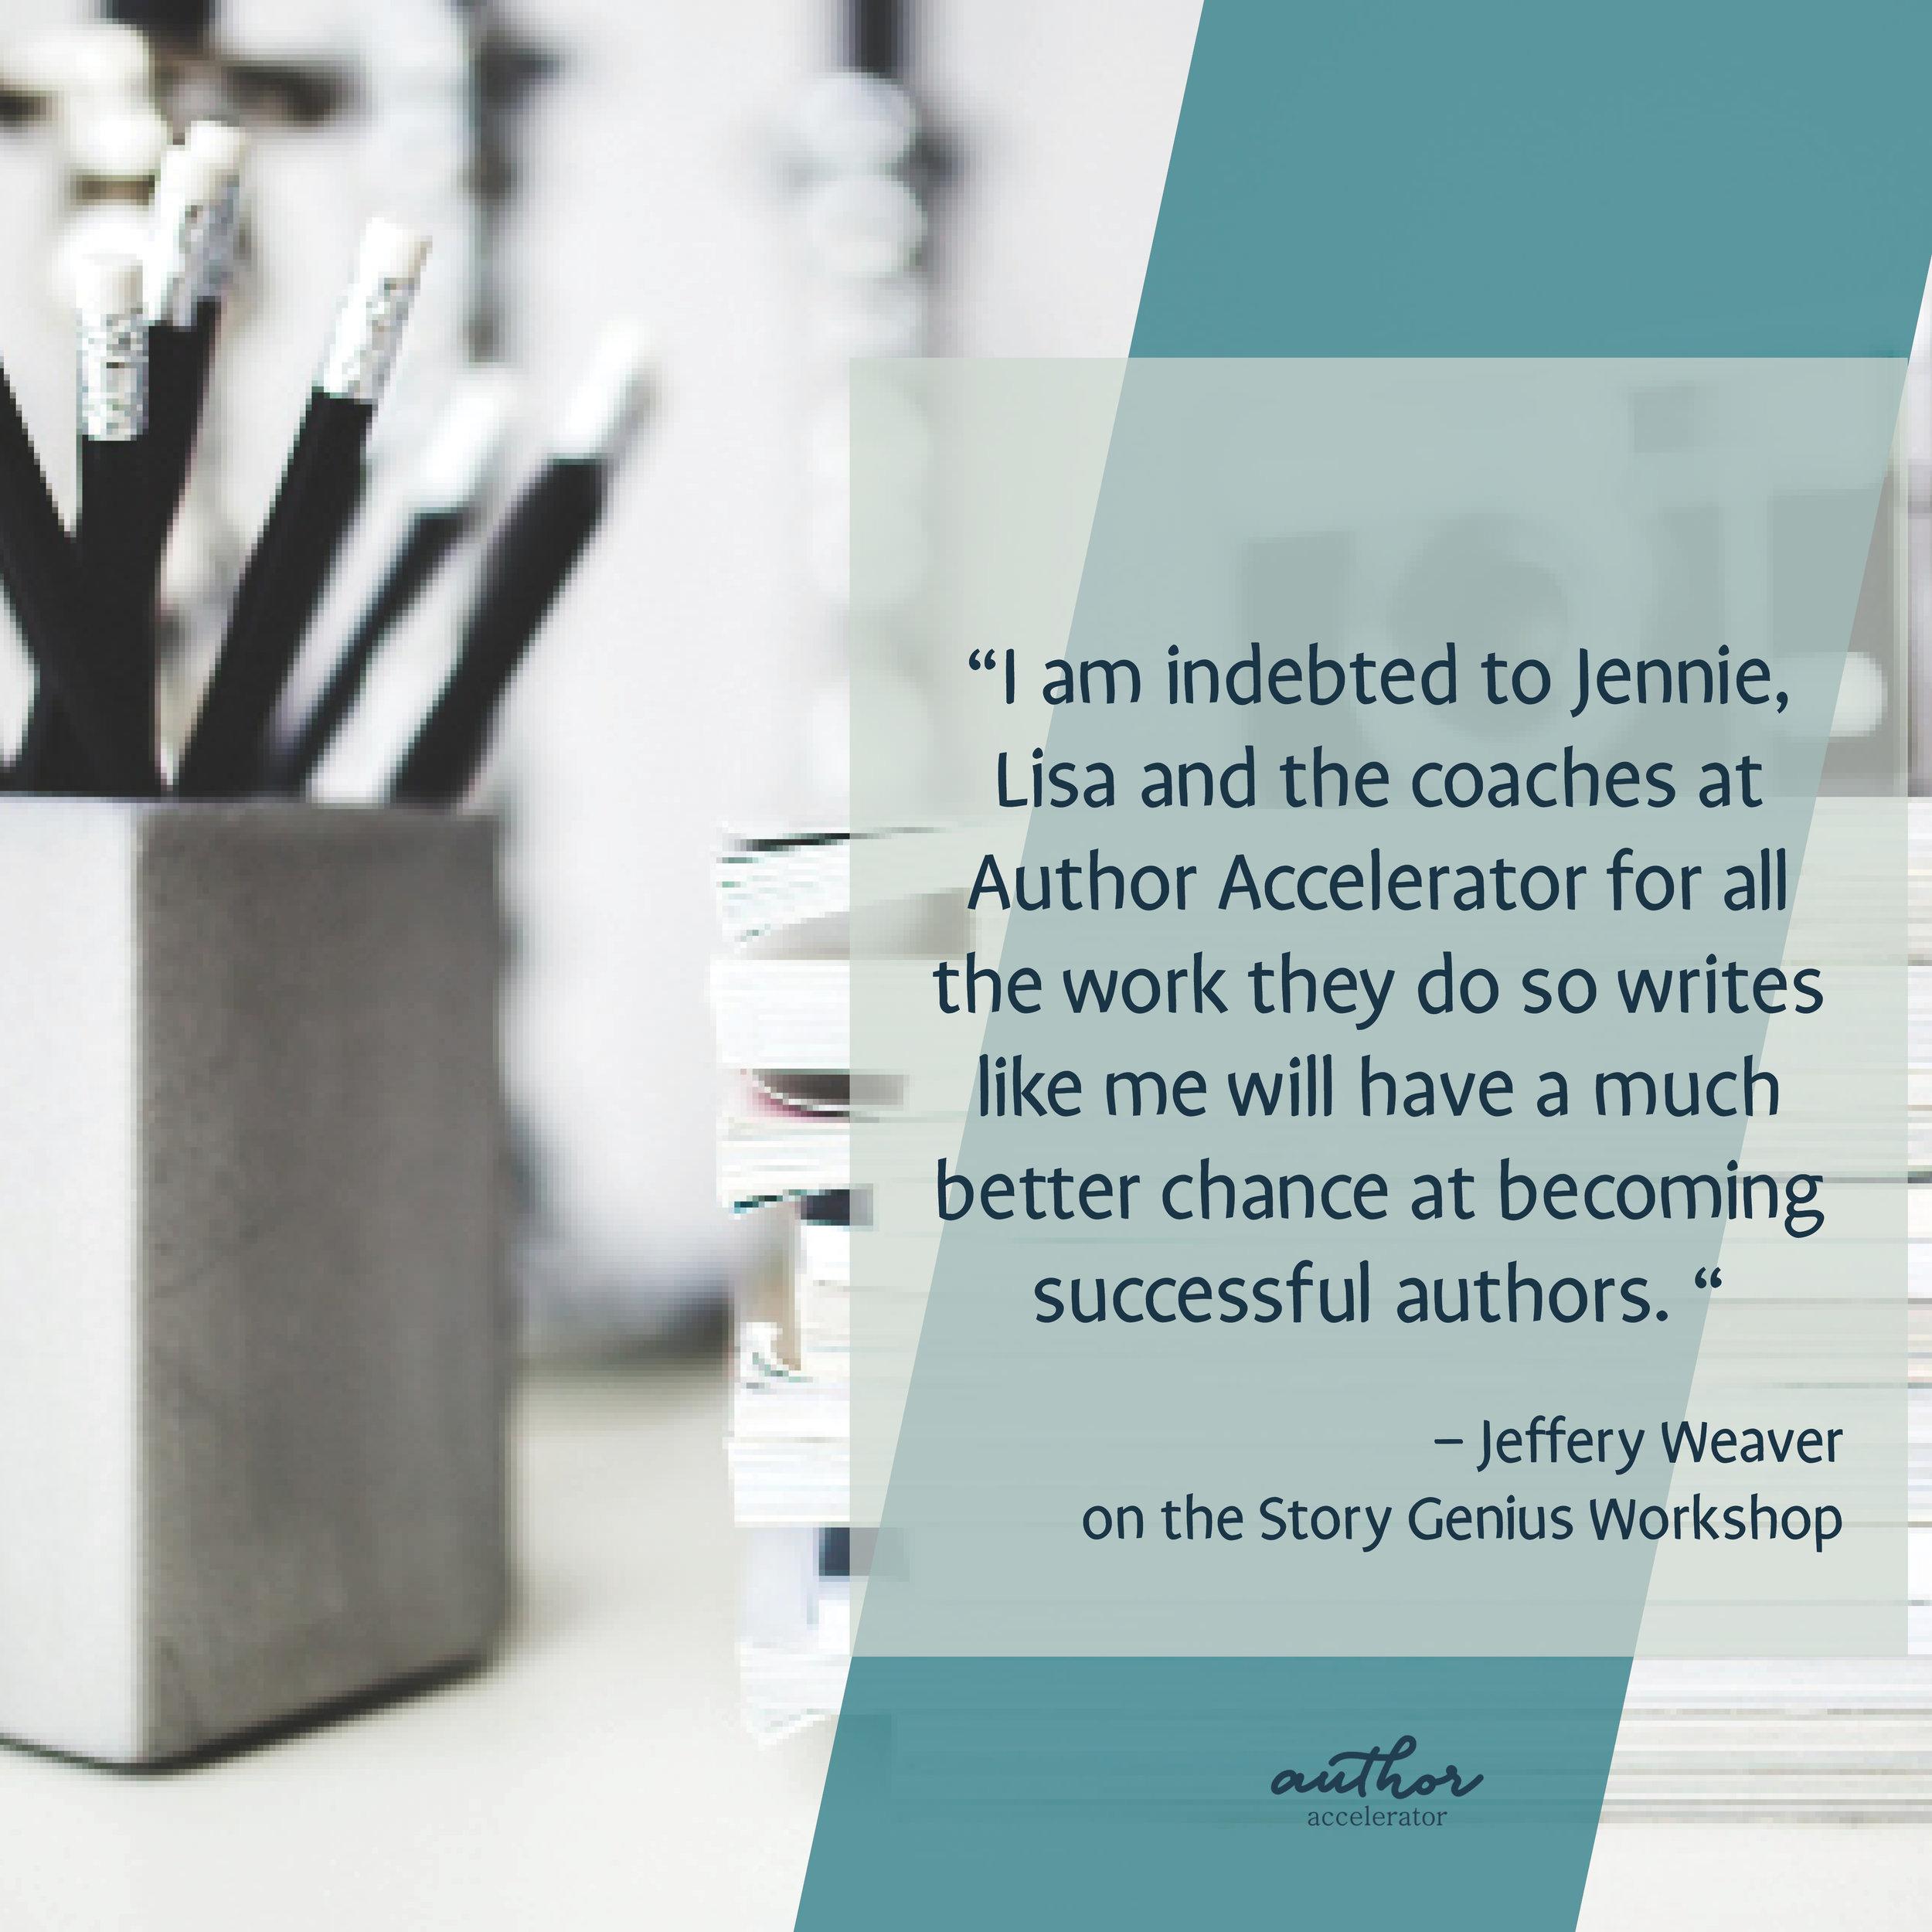 story_genius_jeffery_weaver.jpg